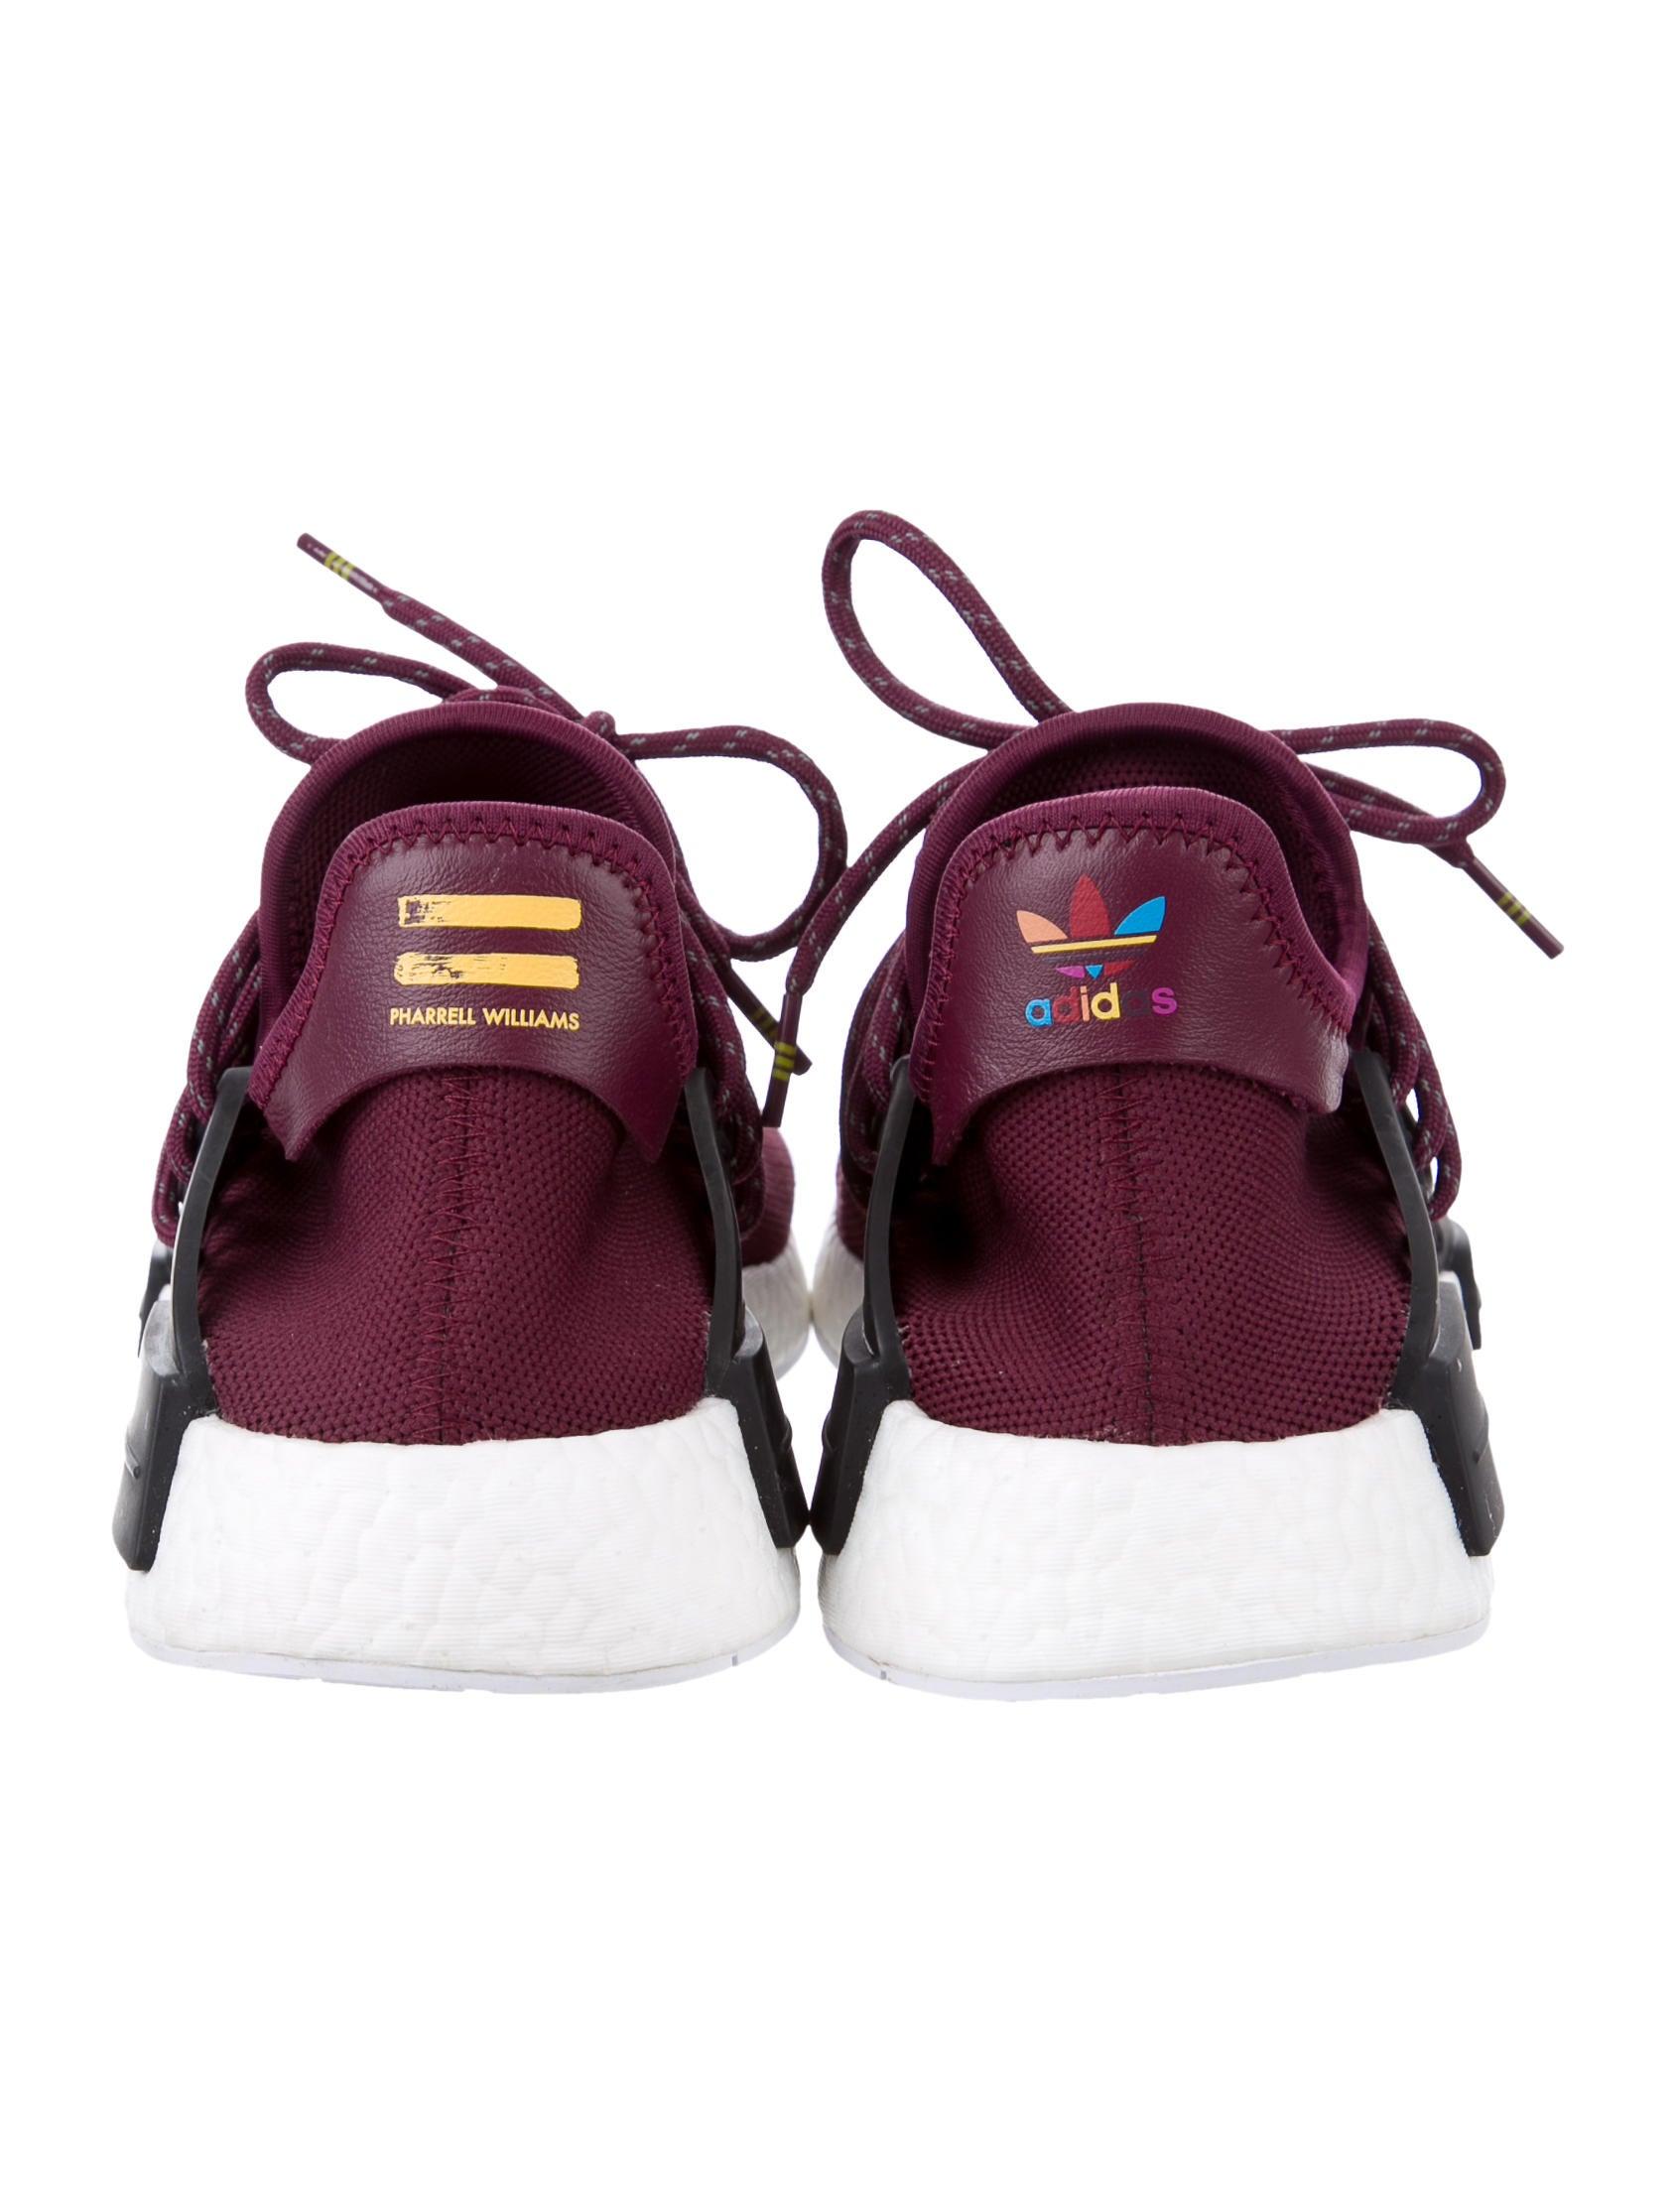 Sneaker News: Pharrell x adidas NMD 'Human Race New Red